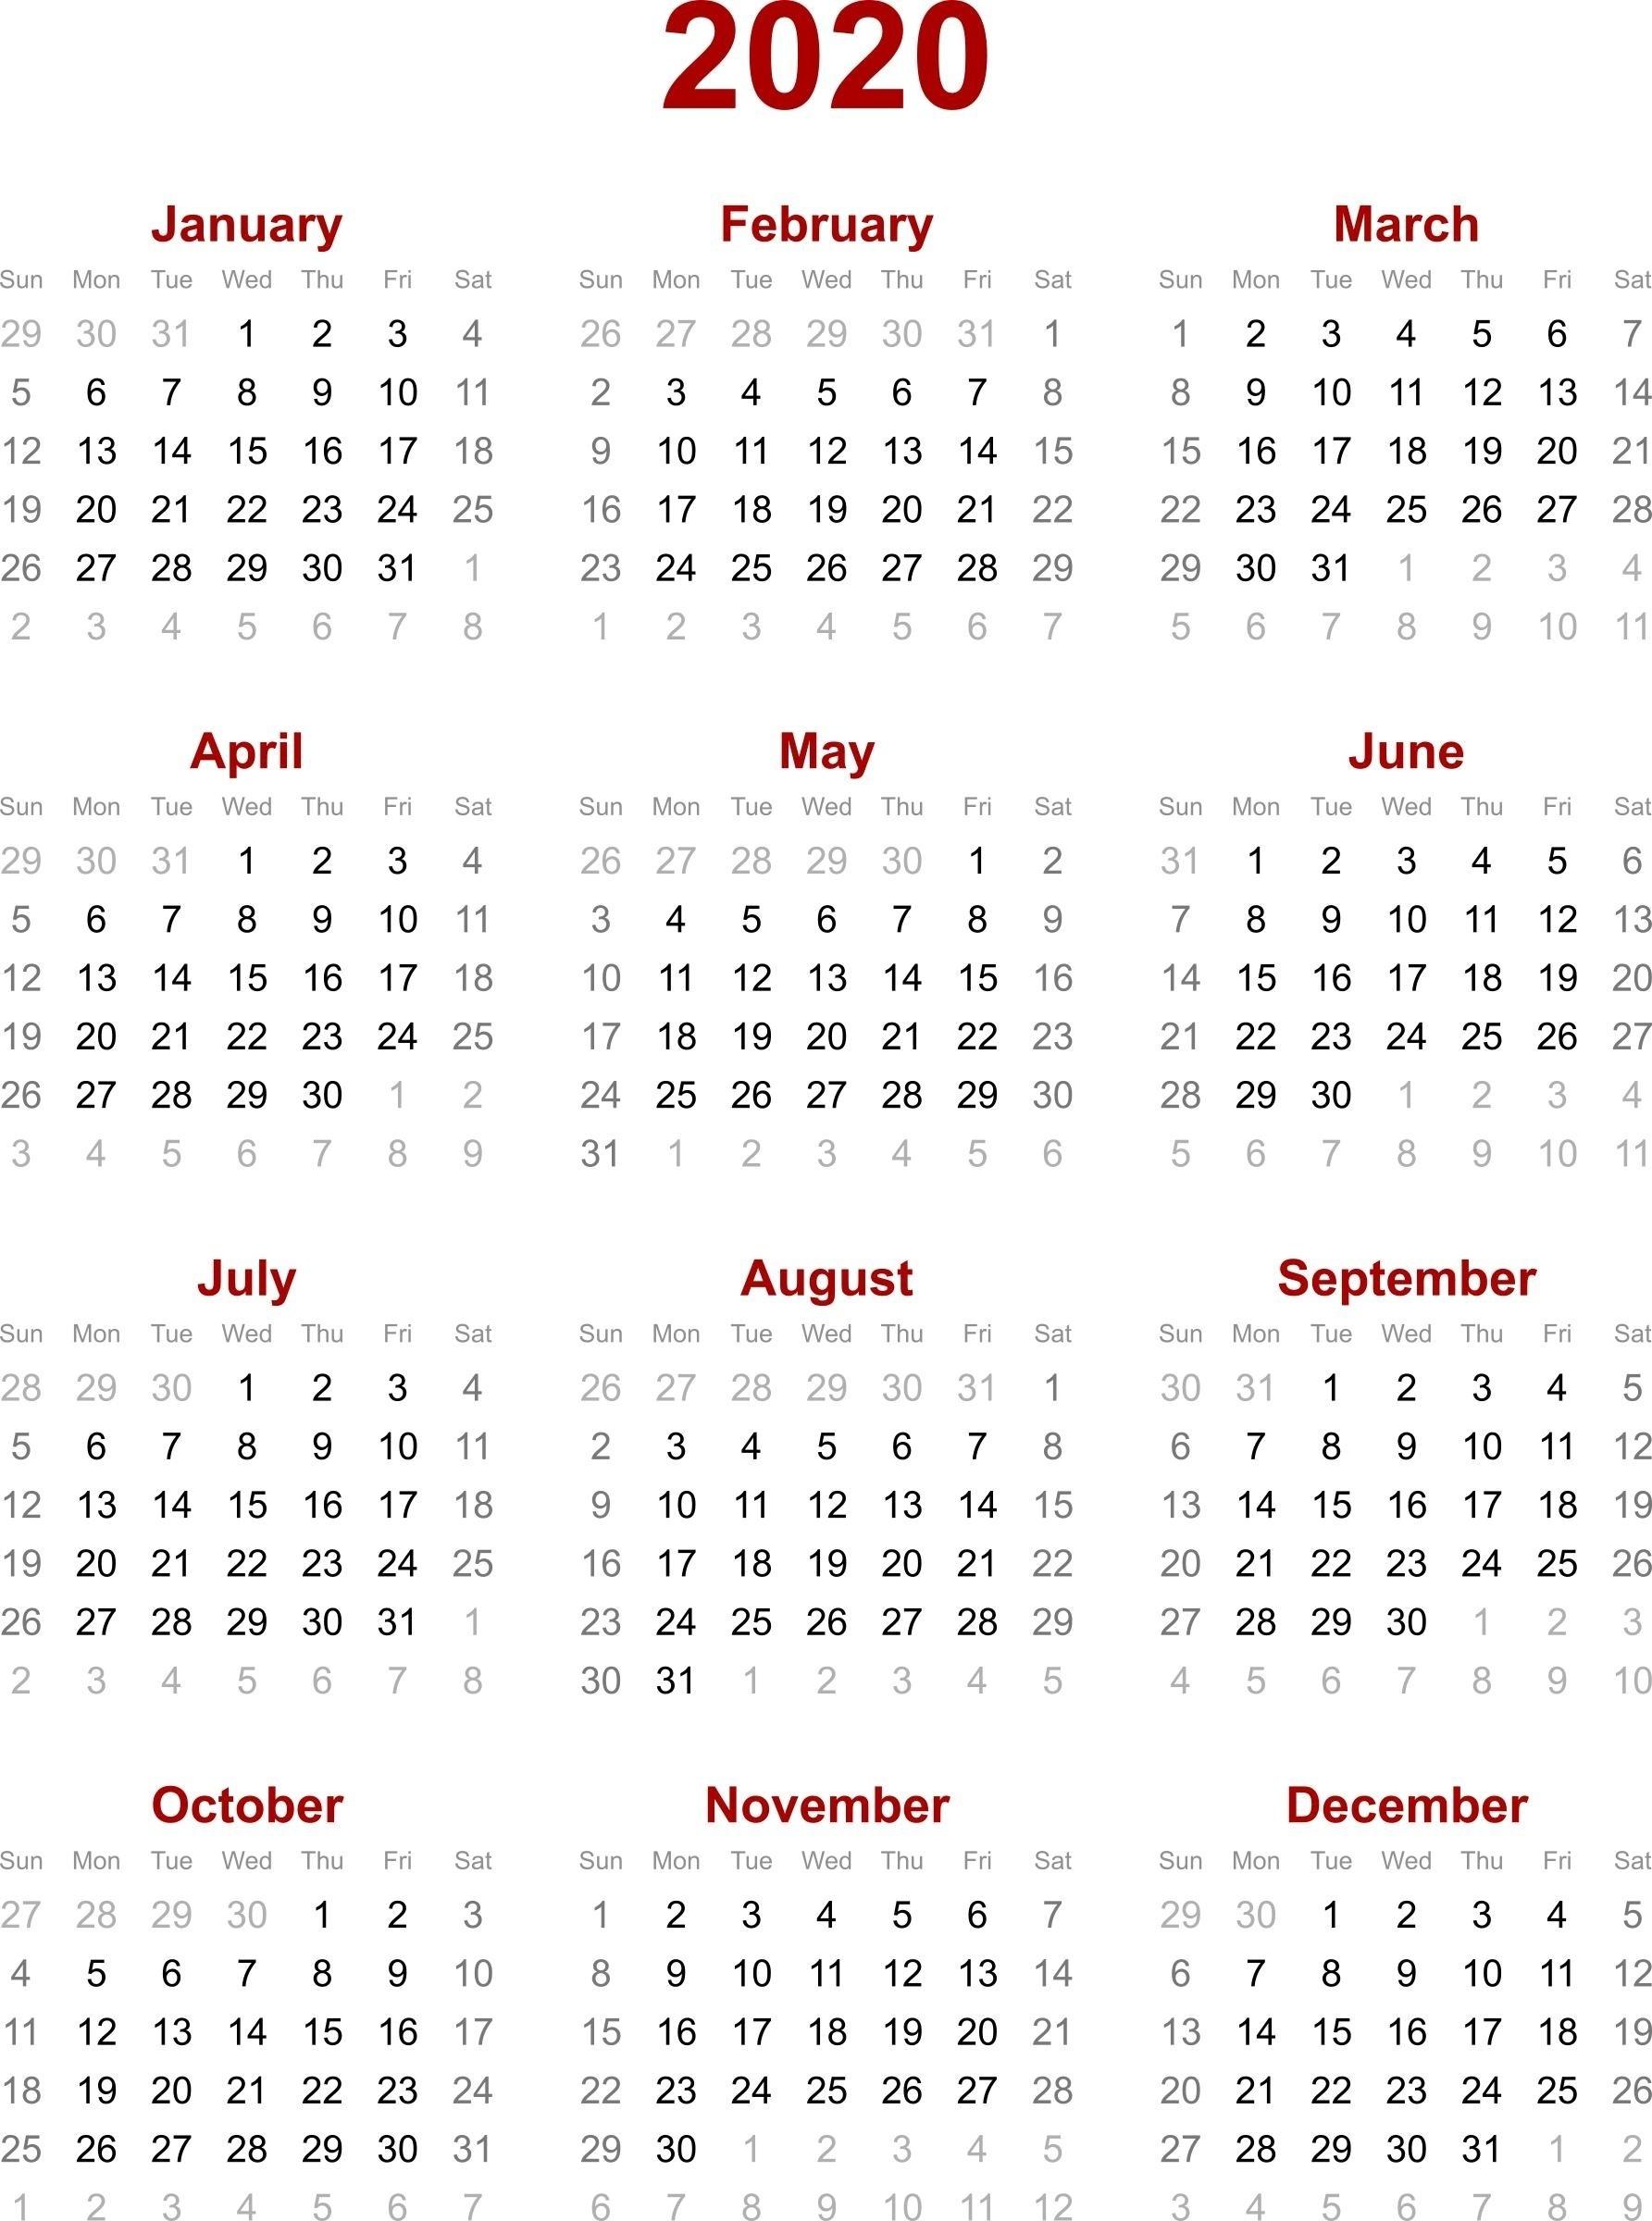 Remarkable 2020 Calendar Singapore Holiday • Printable Blank-January 2020 Calendar Singapore